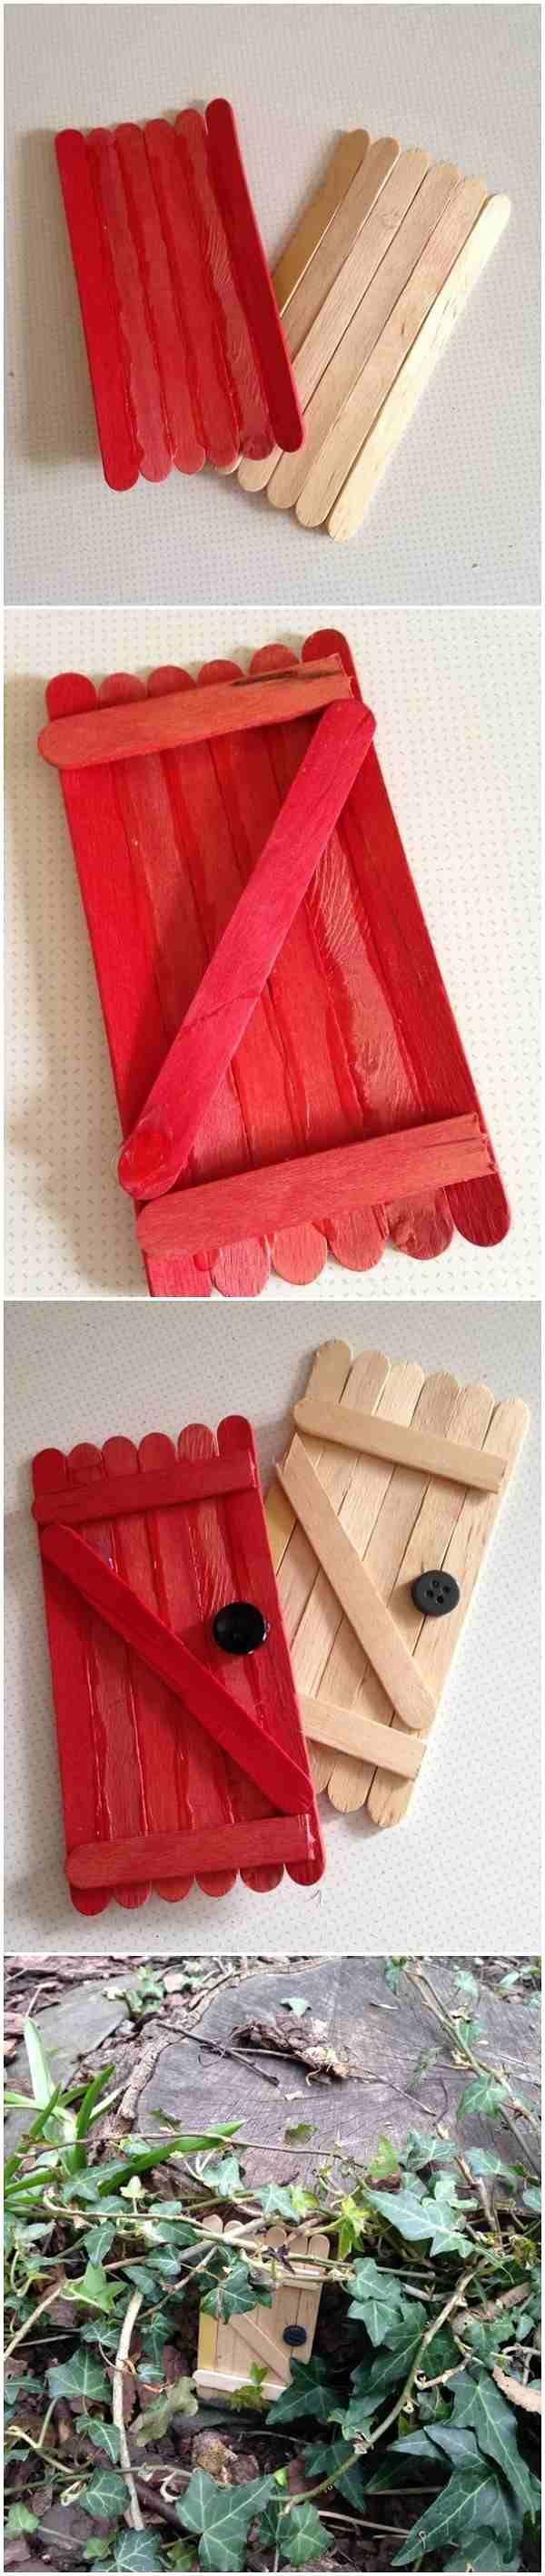 The 25 best lollipop sticks ideas on pinterest lolly for Fairy doors to make